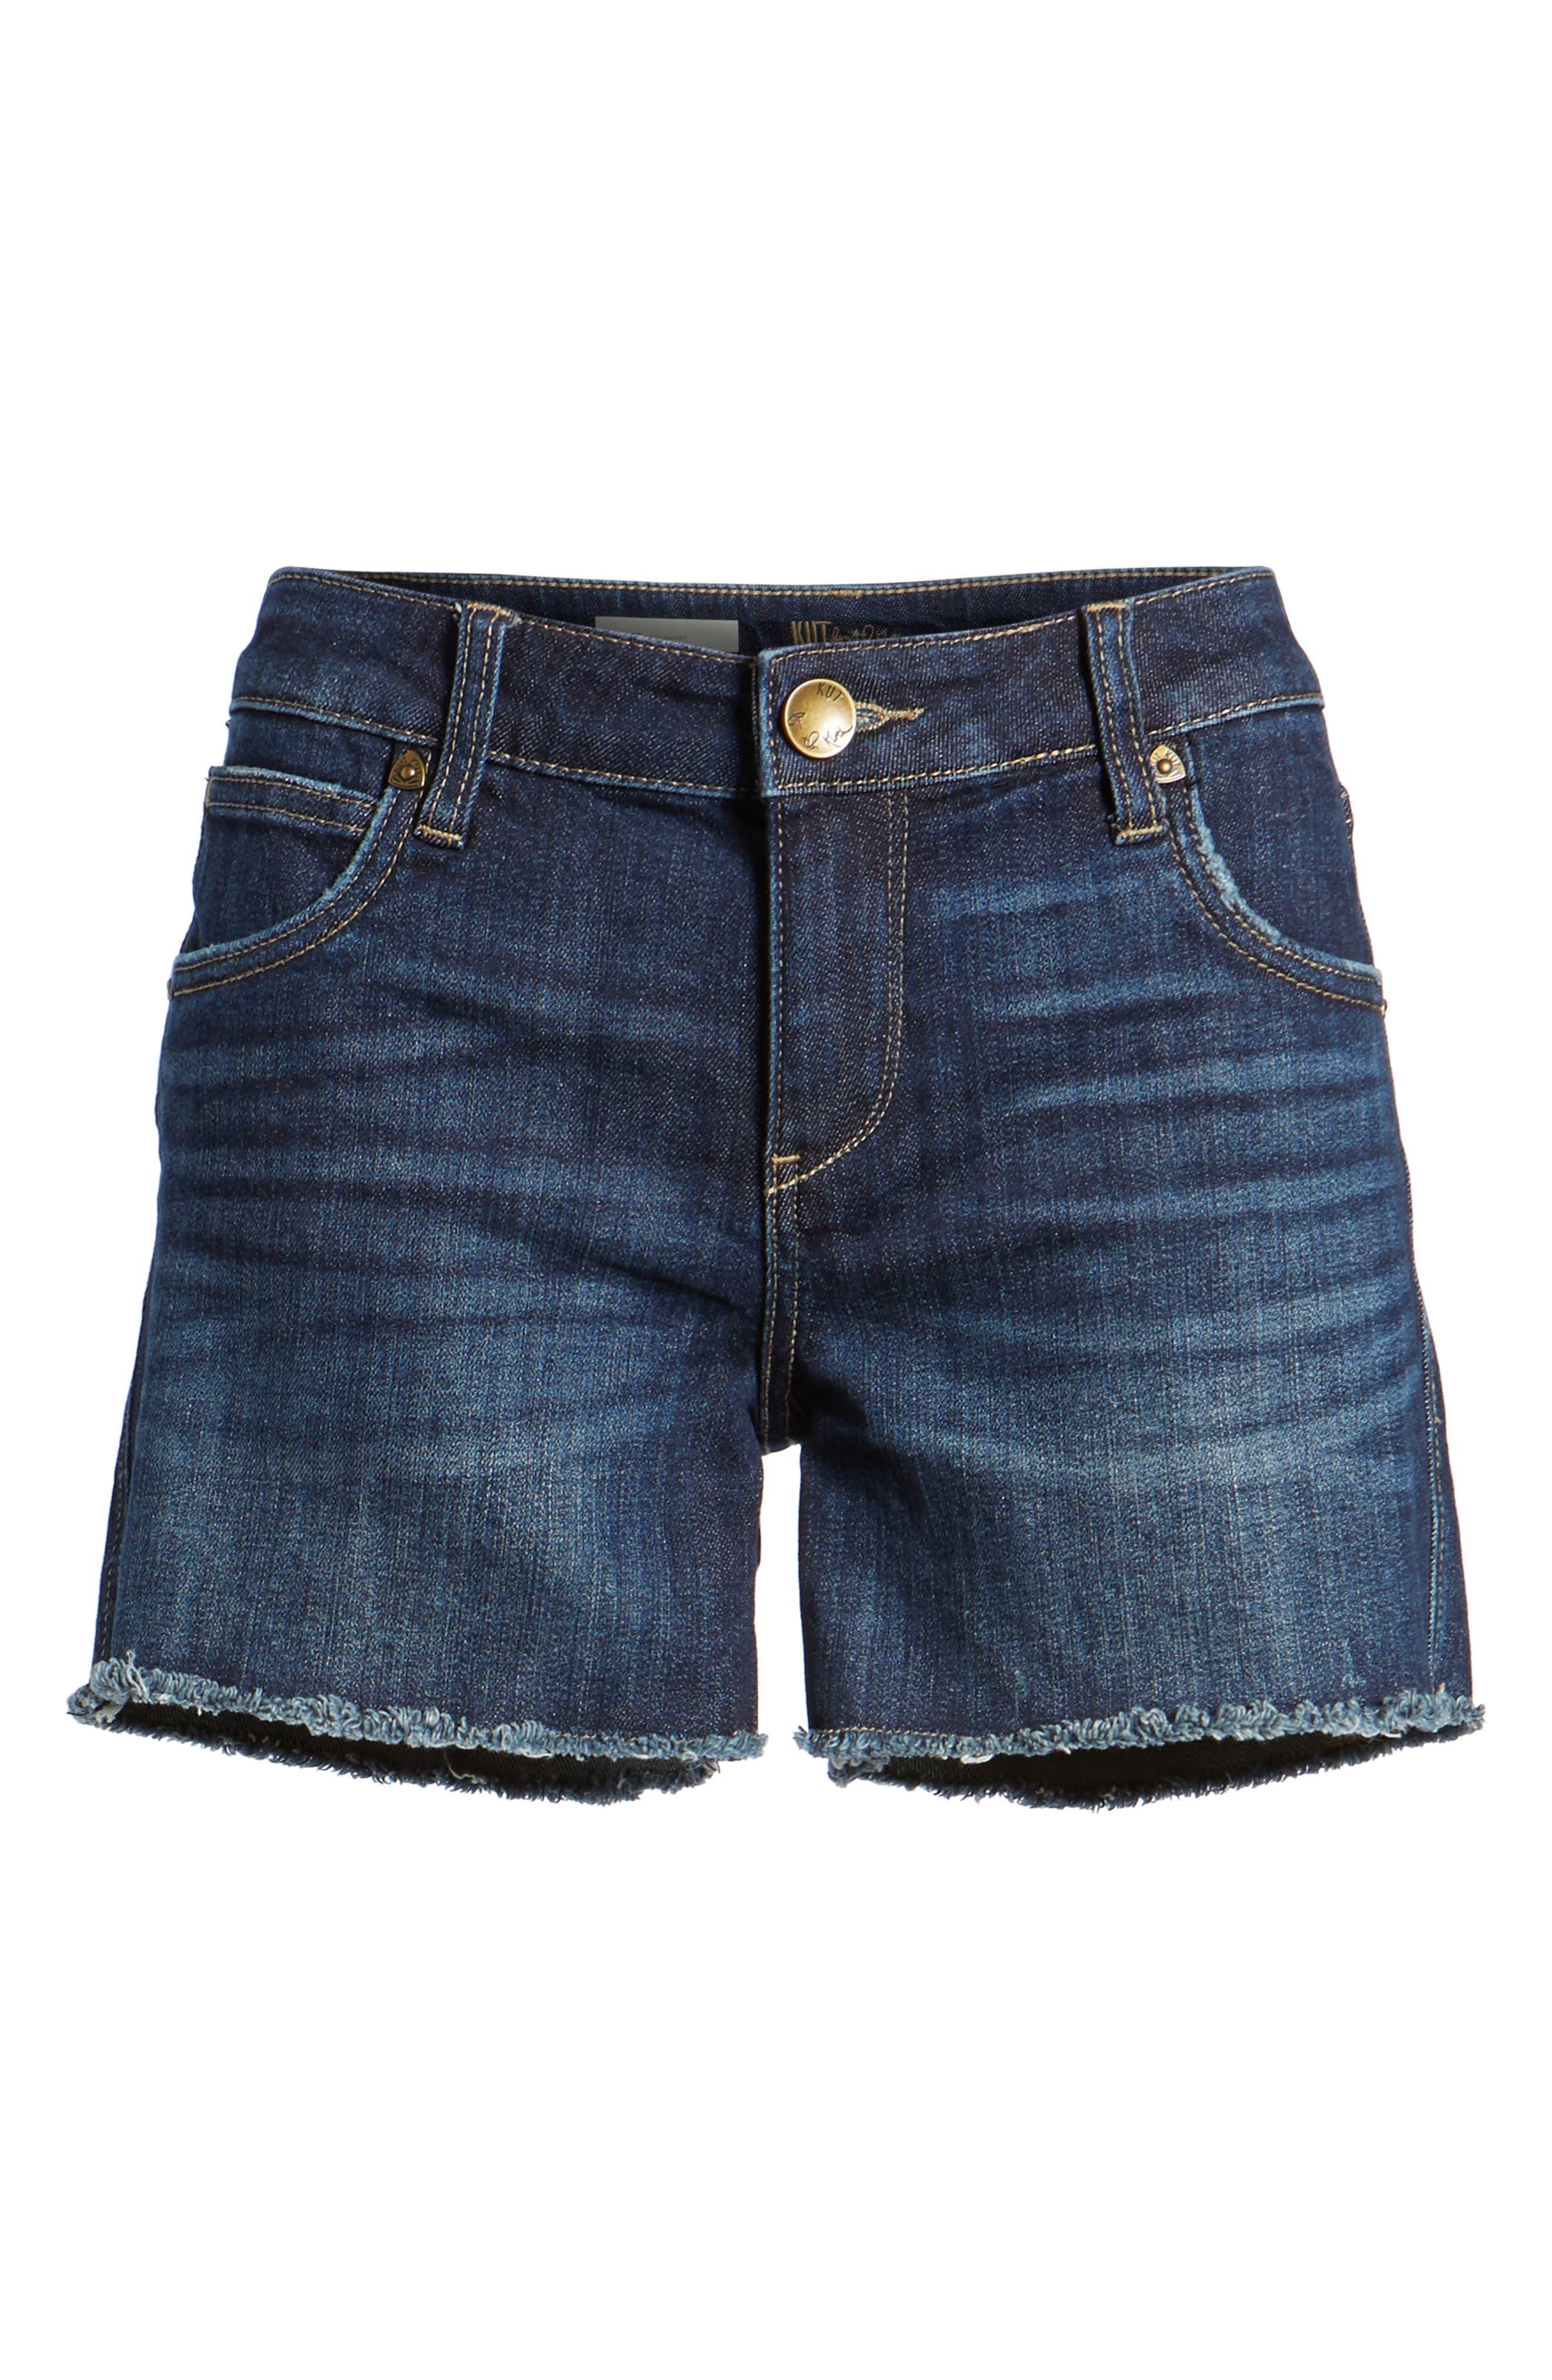 Gidget Denim Cutoff Shorts,                             Alternate thumbnail 6, color,                             STIMULATING